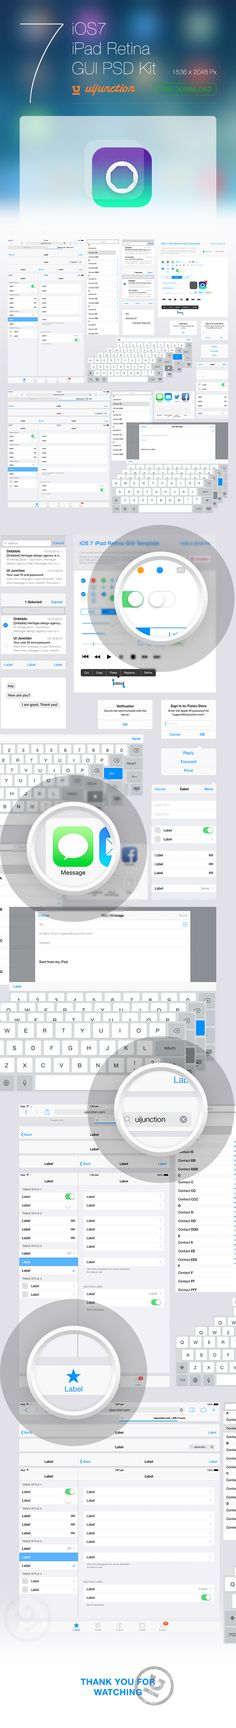 iOS 7 iPad Retina GUI PSD Kit by Chirag , via Behance. It looks beautiful laid out like this. Mobile Ui Design, Dashboard Design, App Ui Design, User Interface Design, Flat Design, Design Design, Design Thinking, Motion Design, Site Image